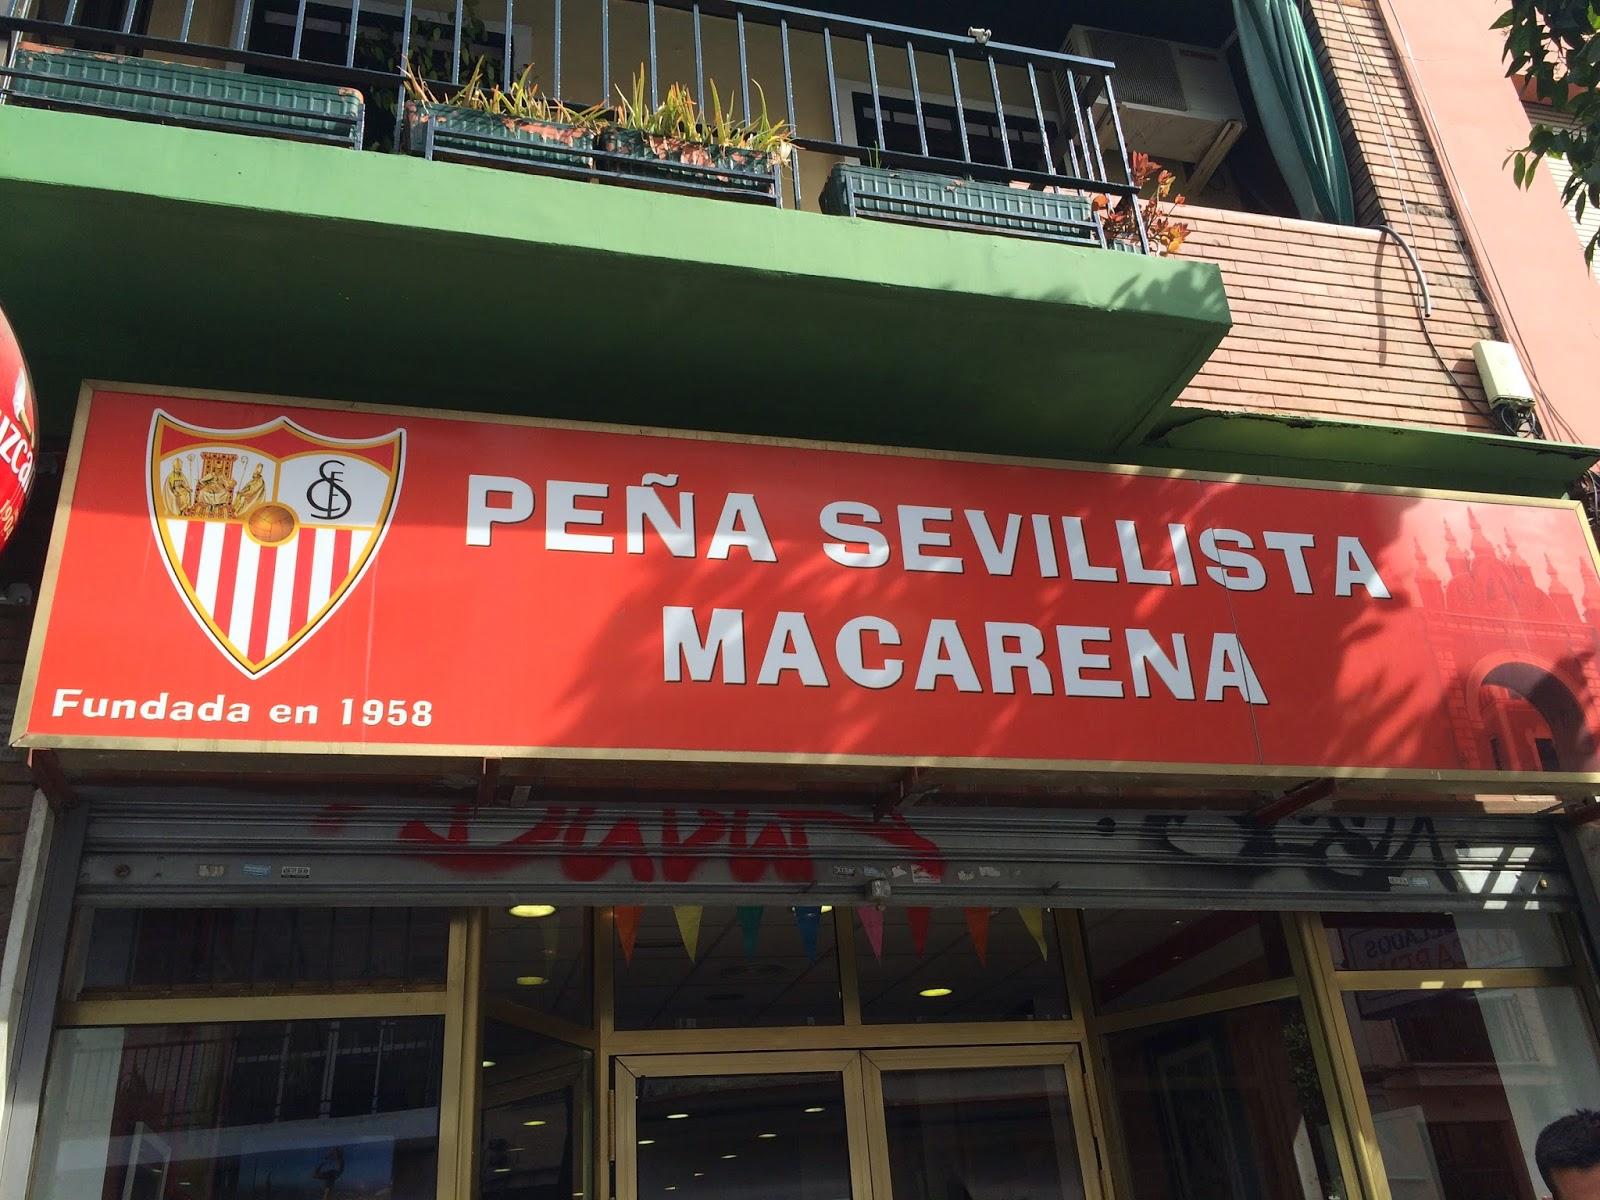 Peña Sevillista Macarena